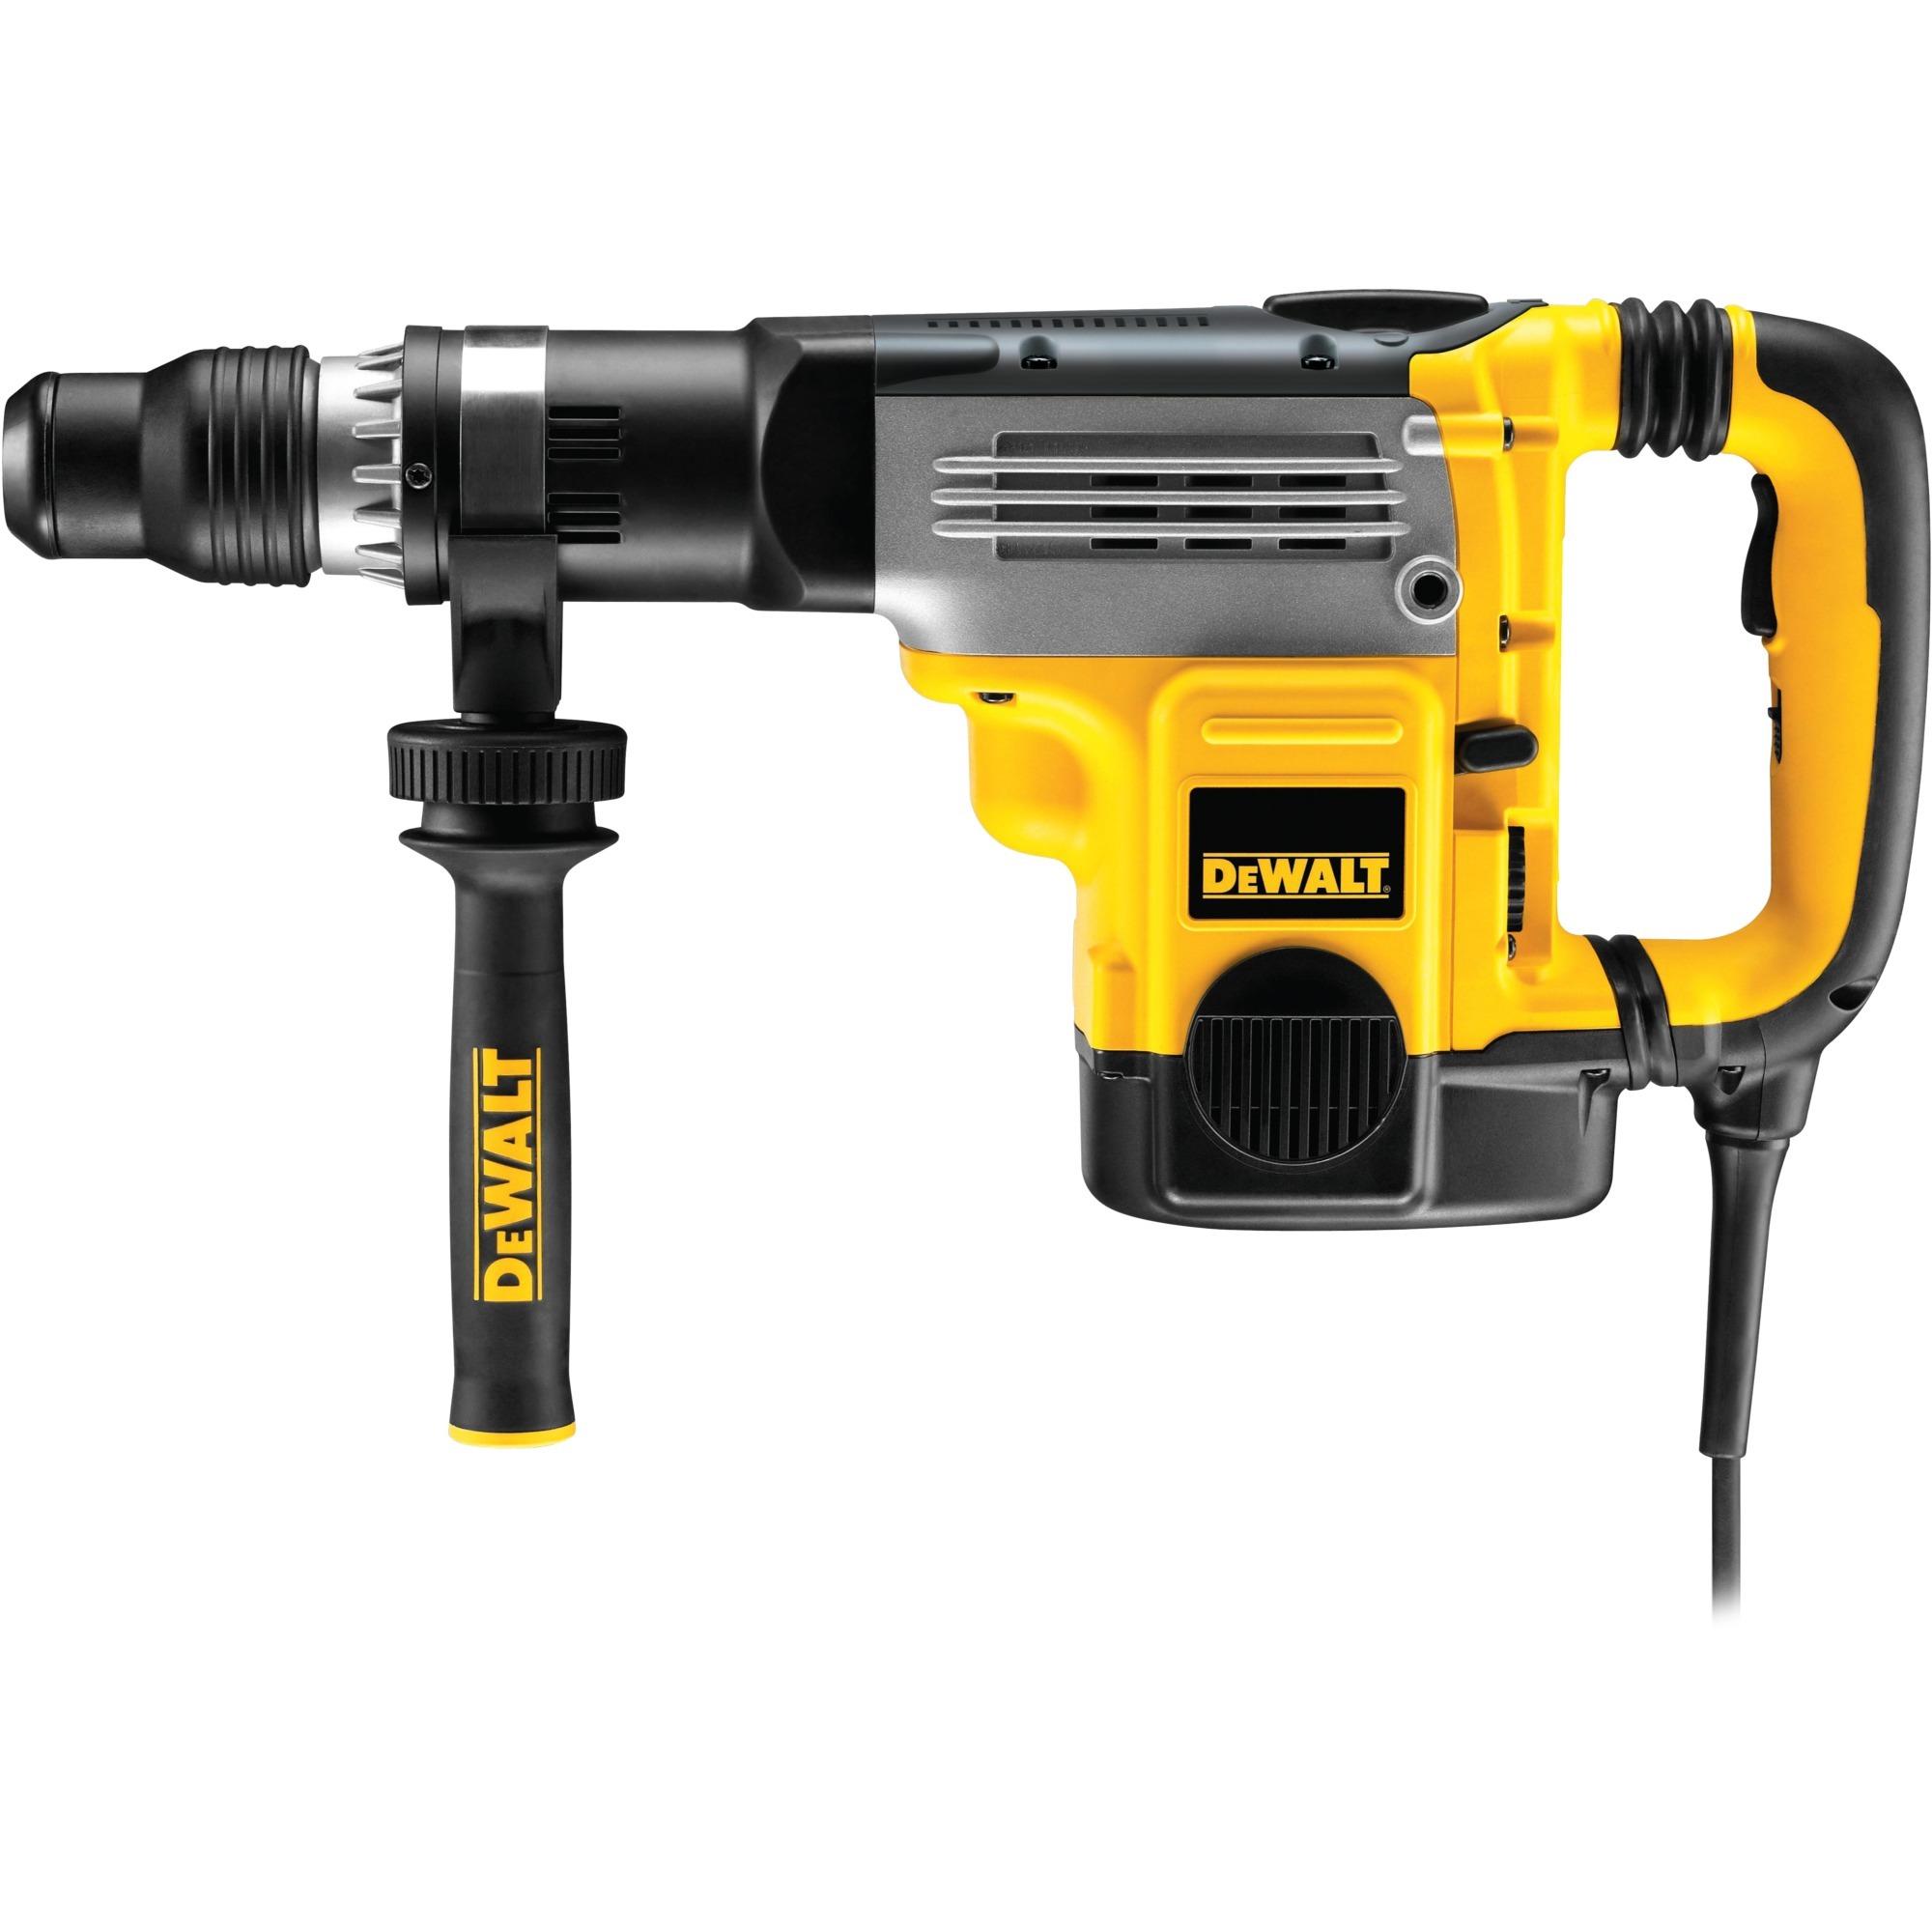 D25763K 1500W SDS Max rotary hammers, Martillo perforador